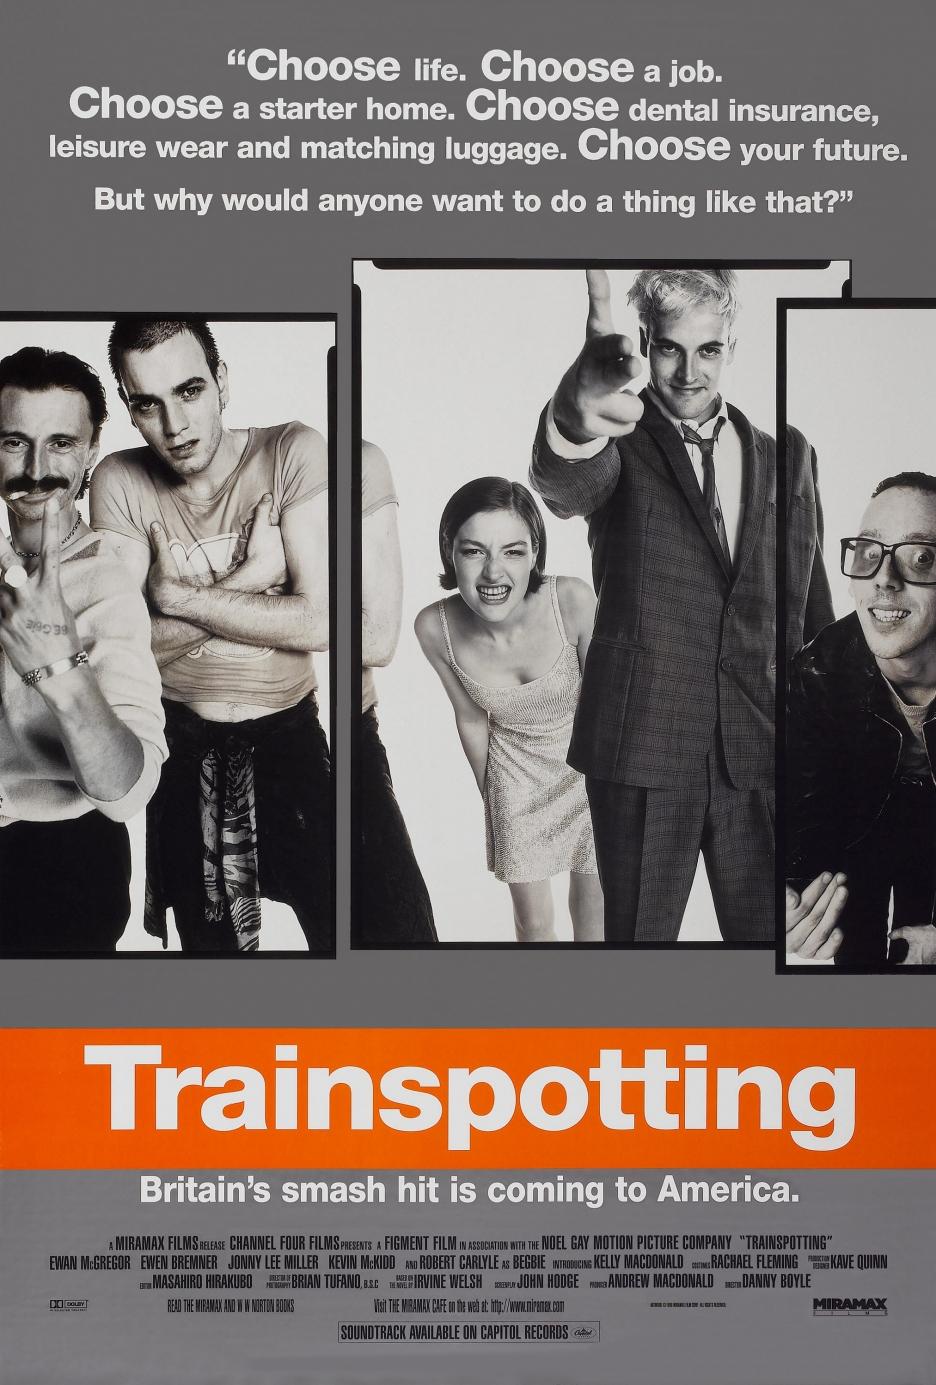 Trainspotting movie poster